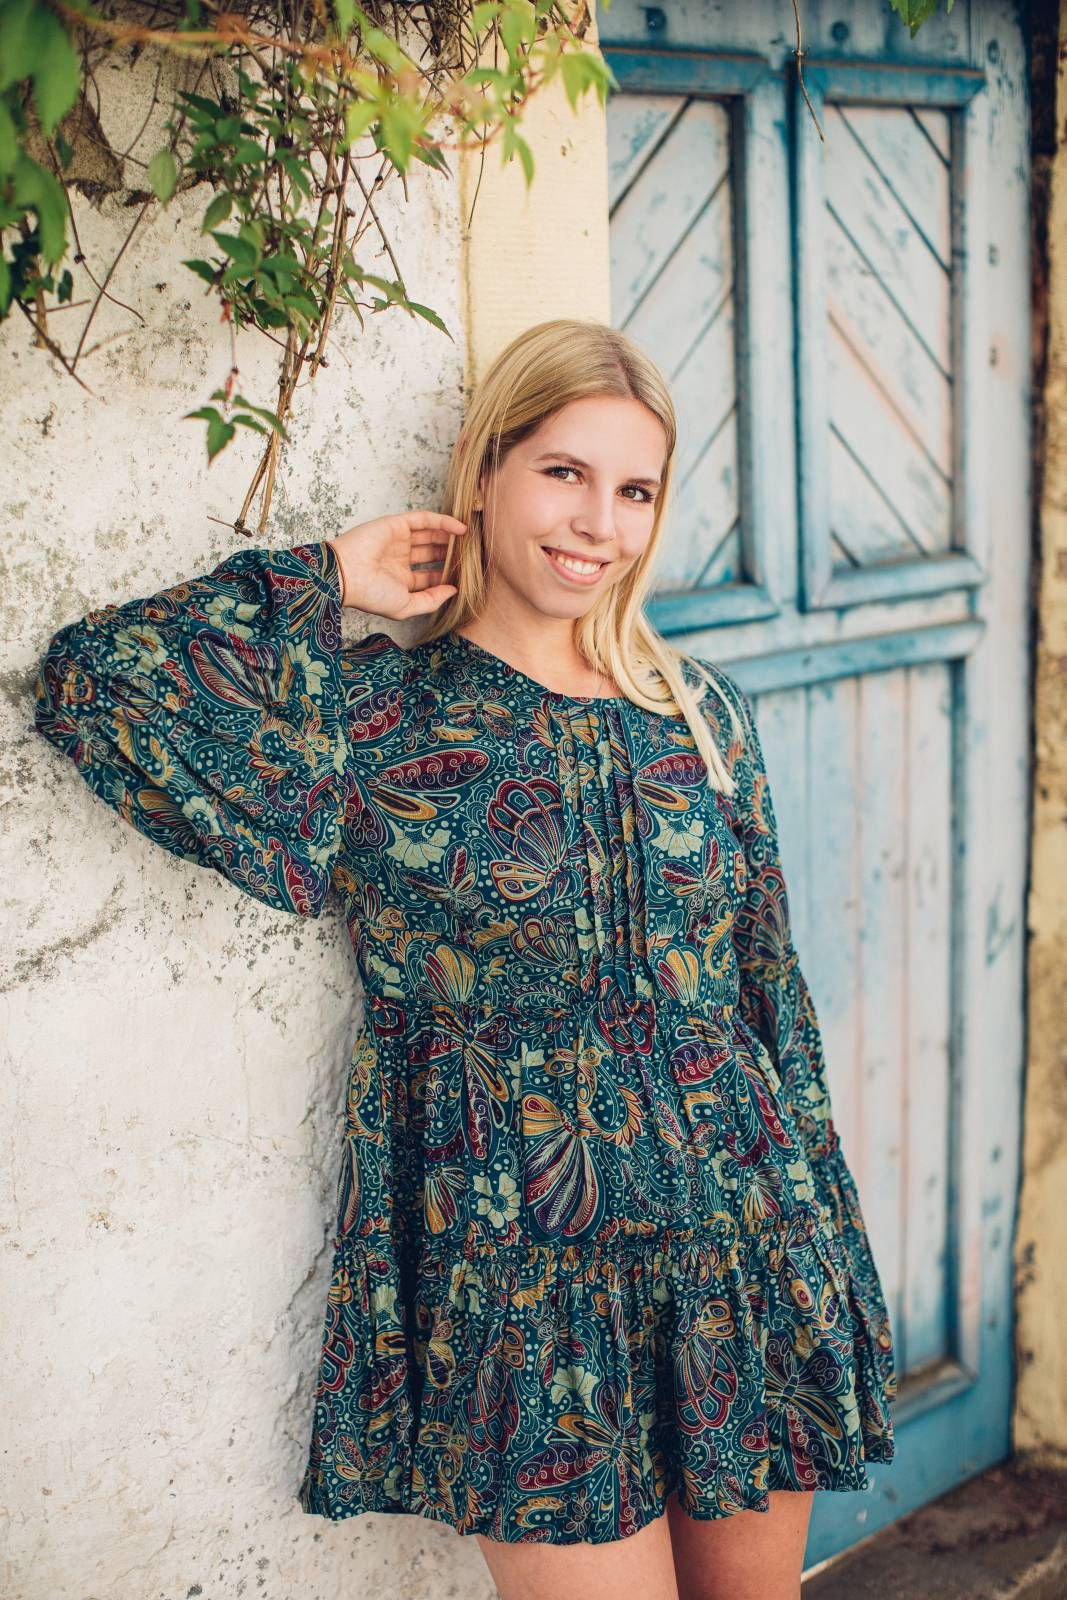 Boho Tunika Kleid Mit Trompetenarmeln Ibiza Boho Outfit Babydollkleid 58 00 Tunika Kleid Boho Tunika Kleid Trompetenarmel